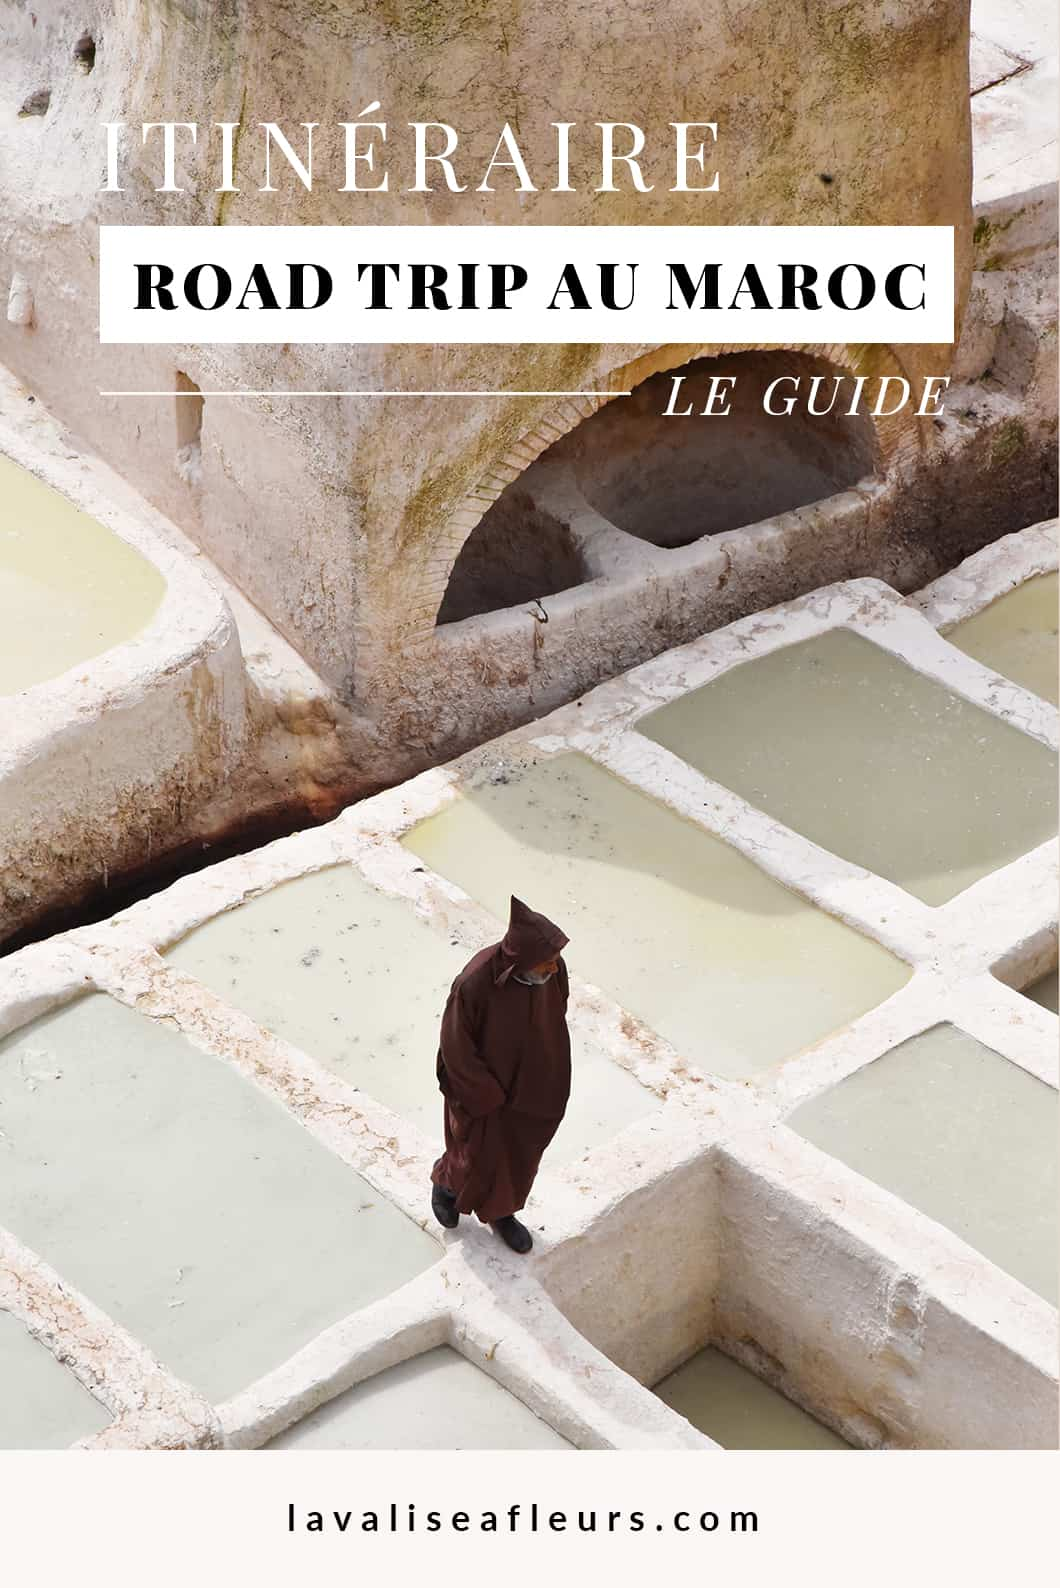 Itinéraire road trip au Maroc